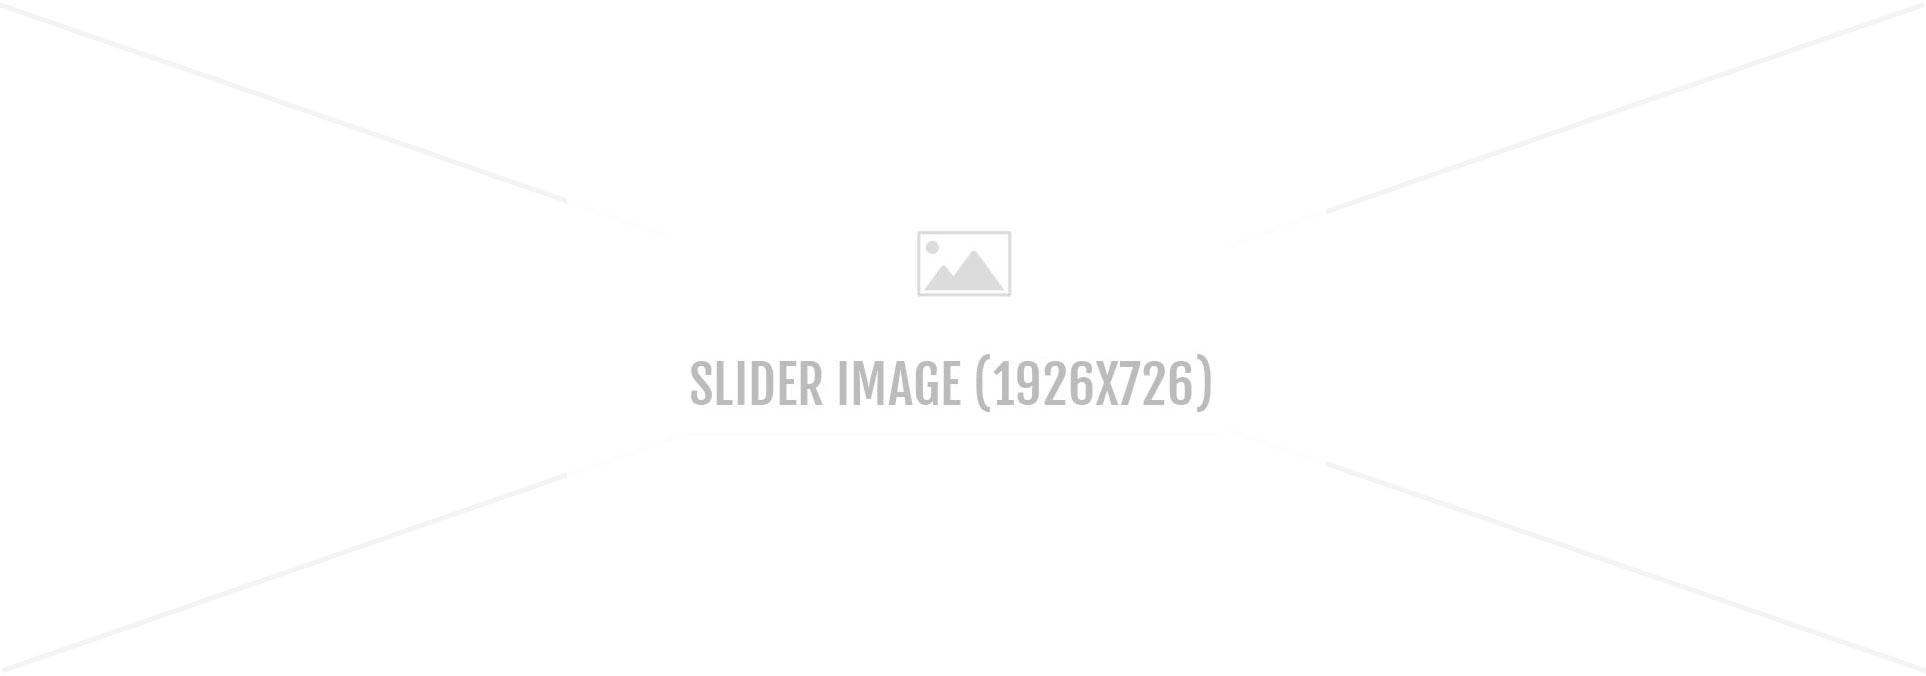 Slider placeholder